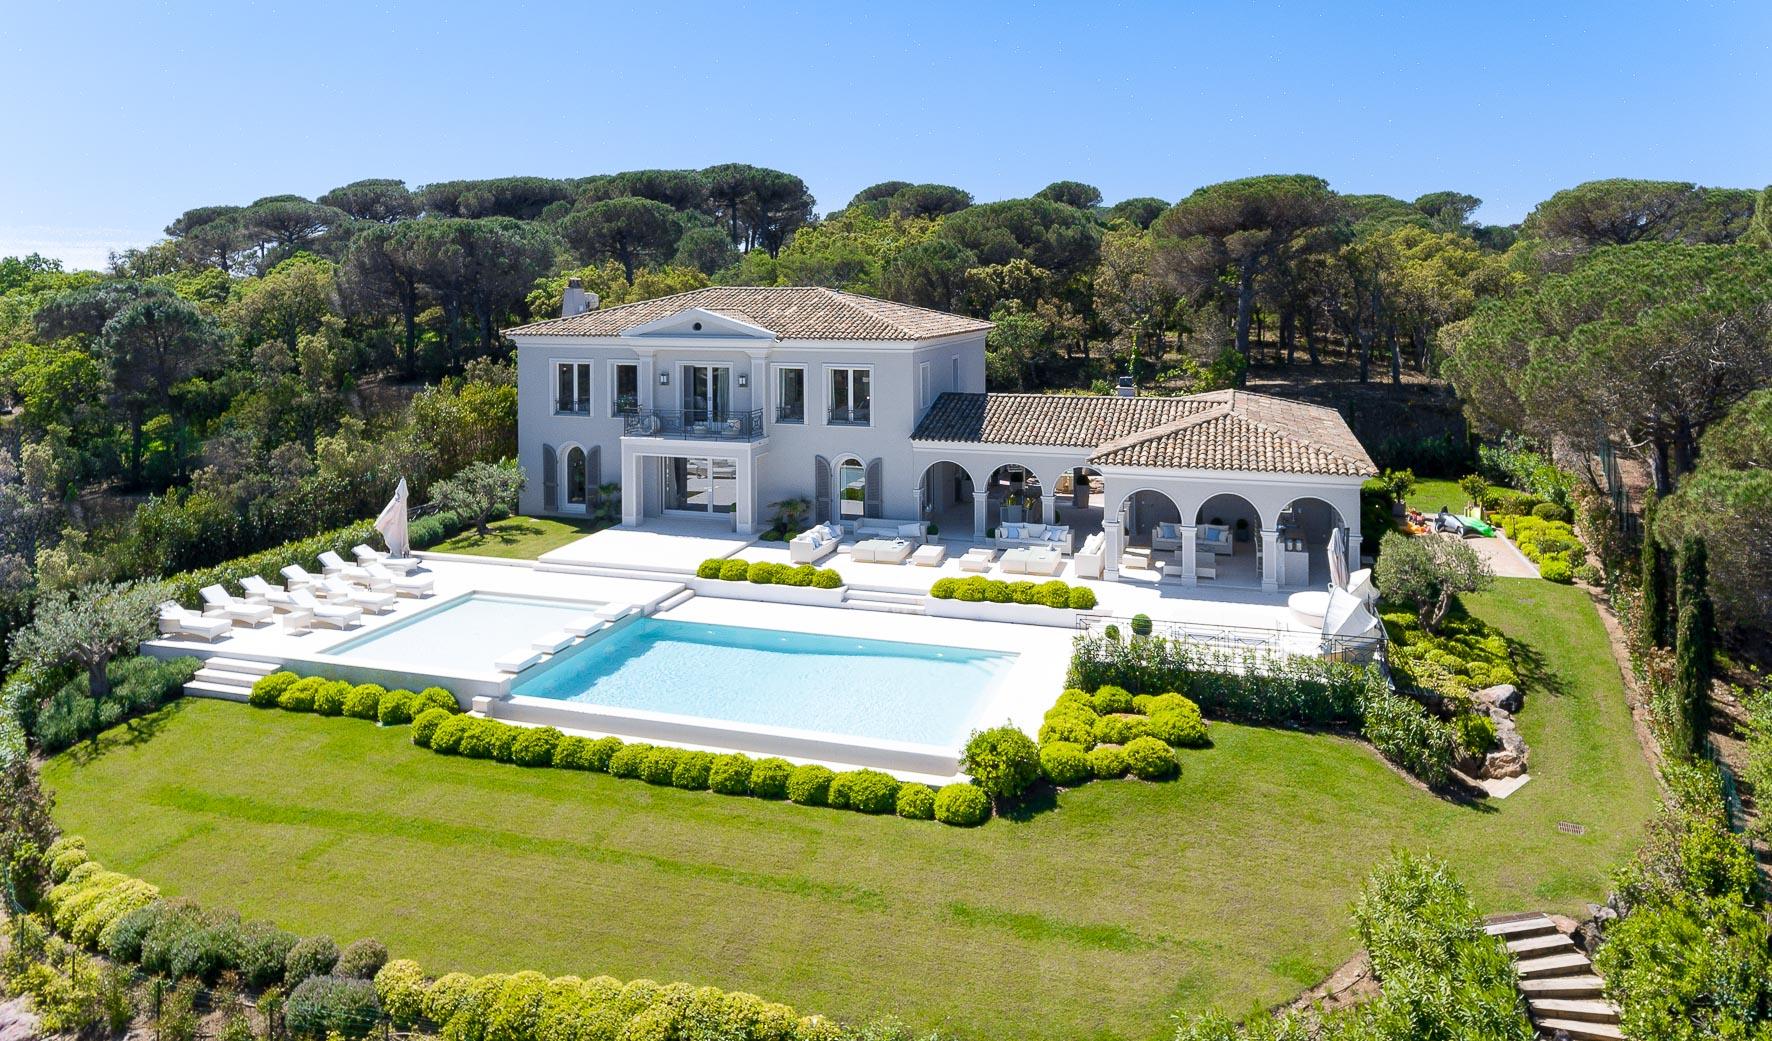 La Chamade villa overview image